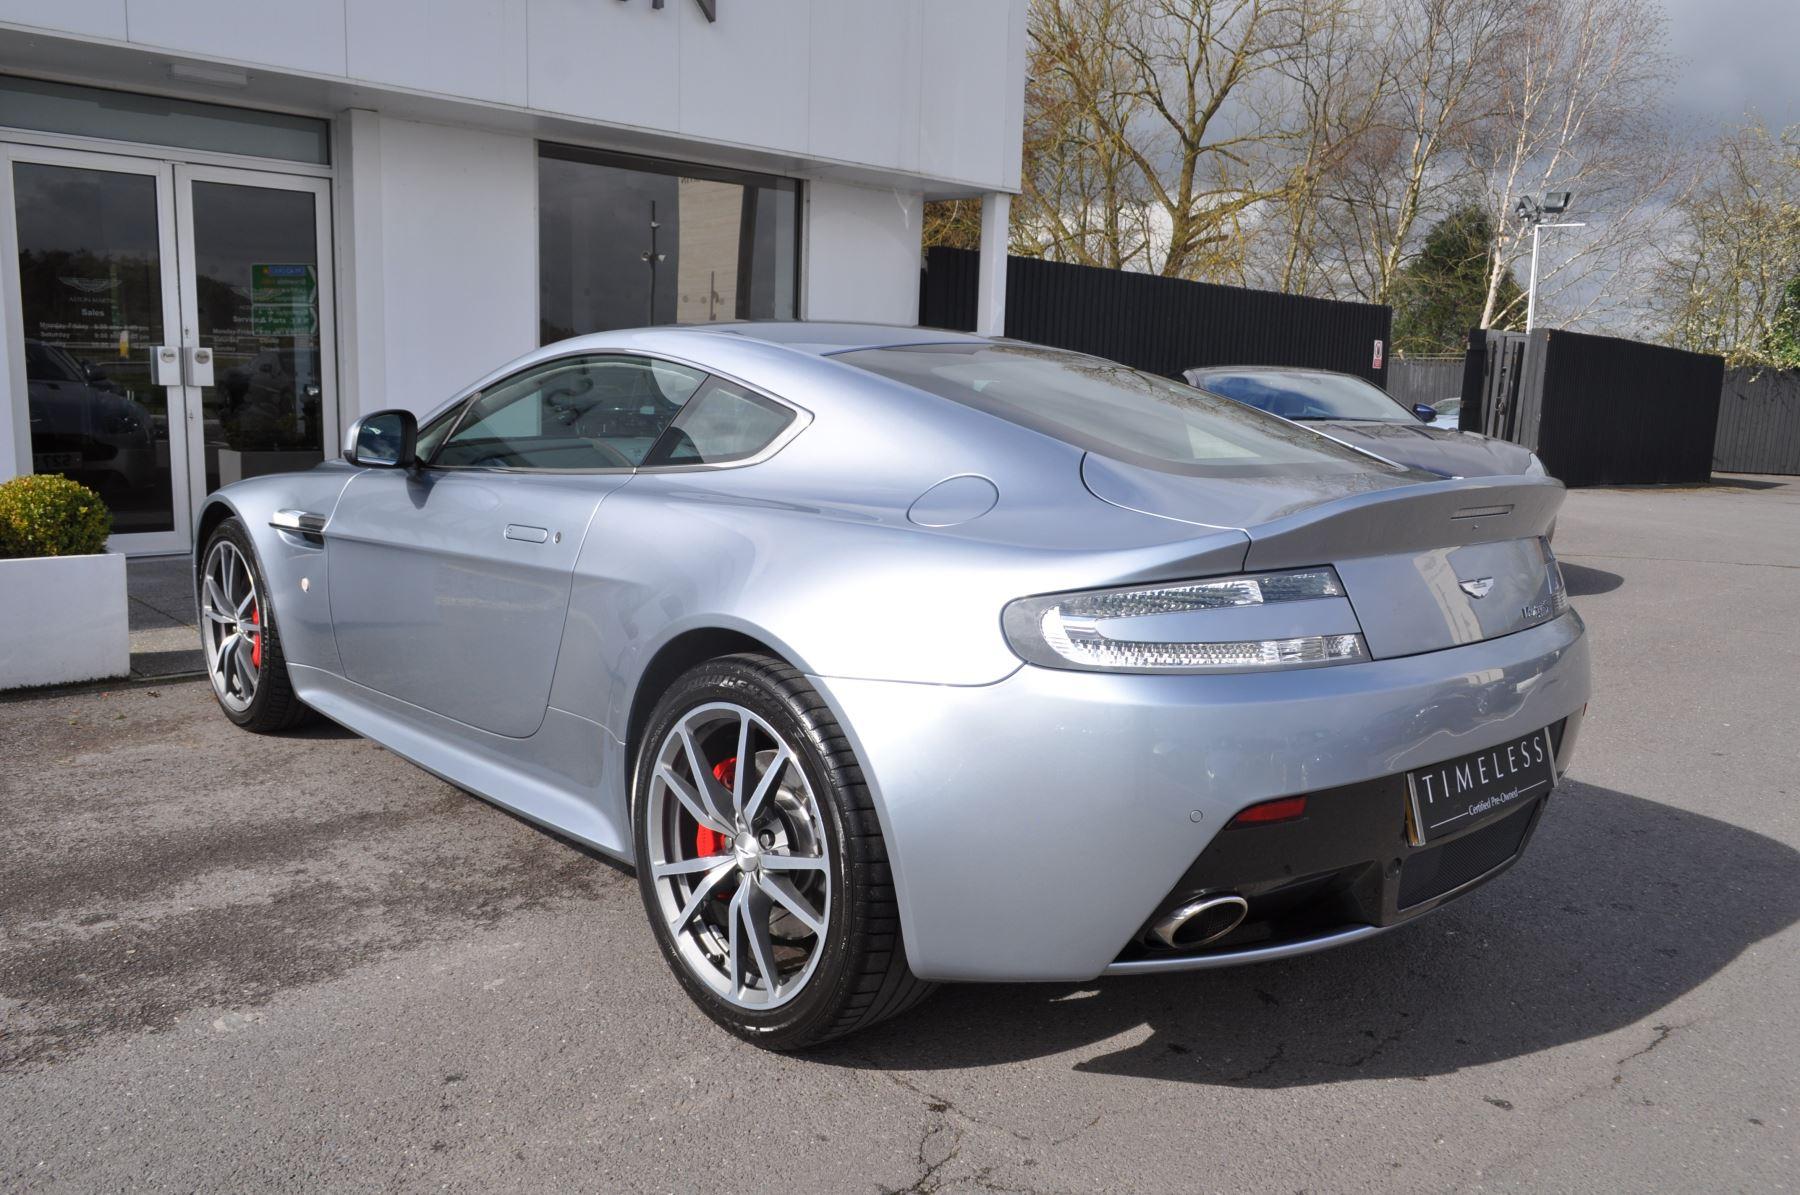 Aston Martin V8 Vantage S Coupe Coupe image 7